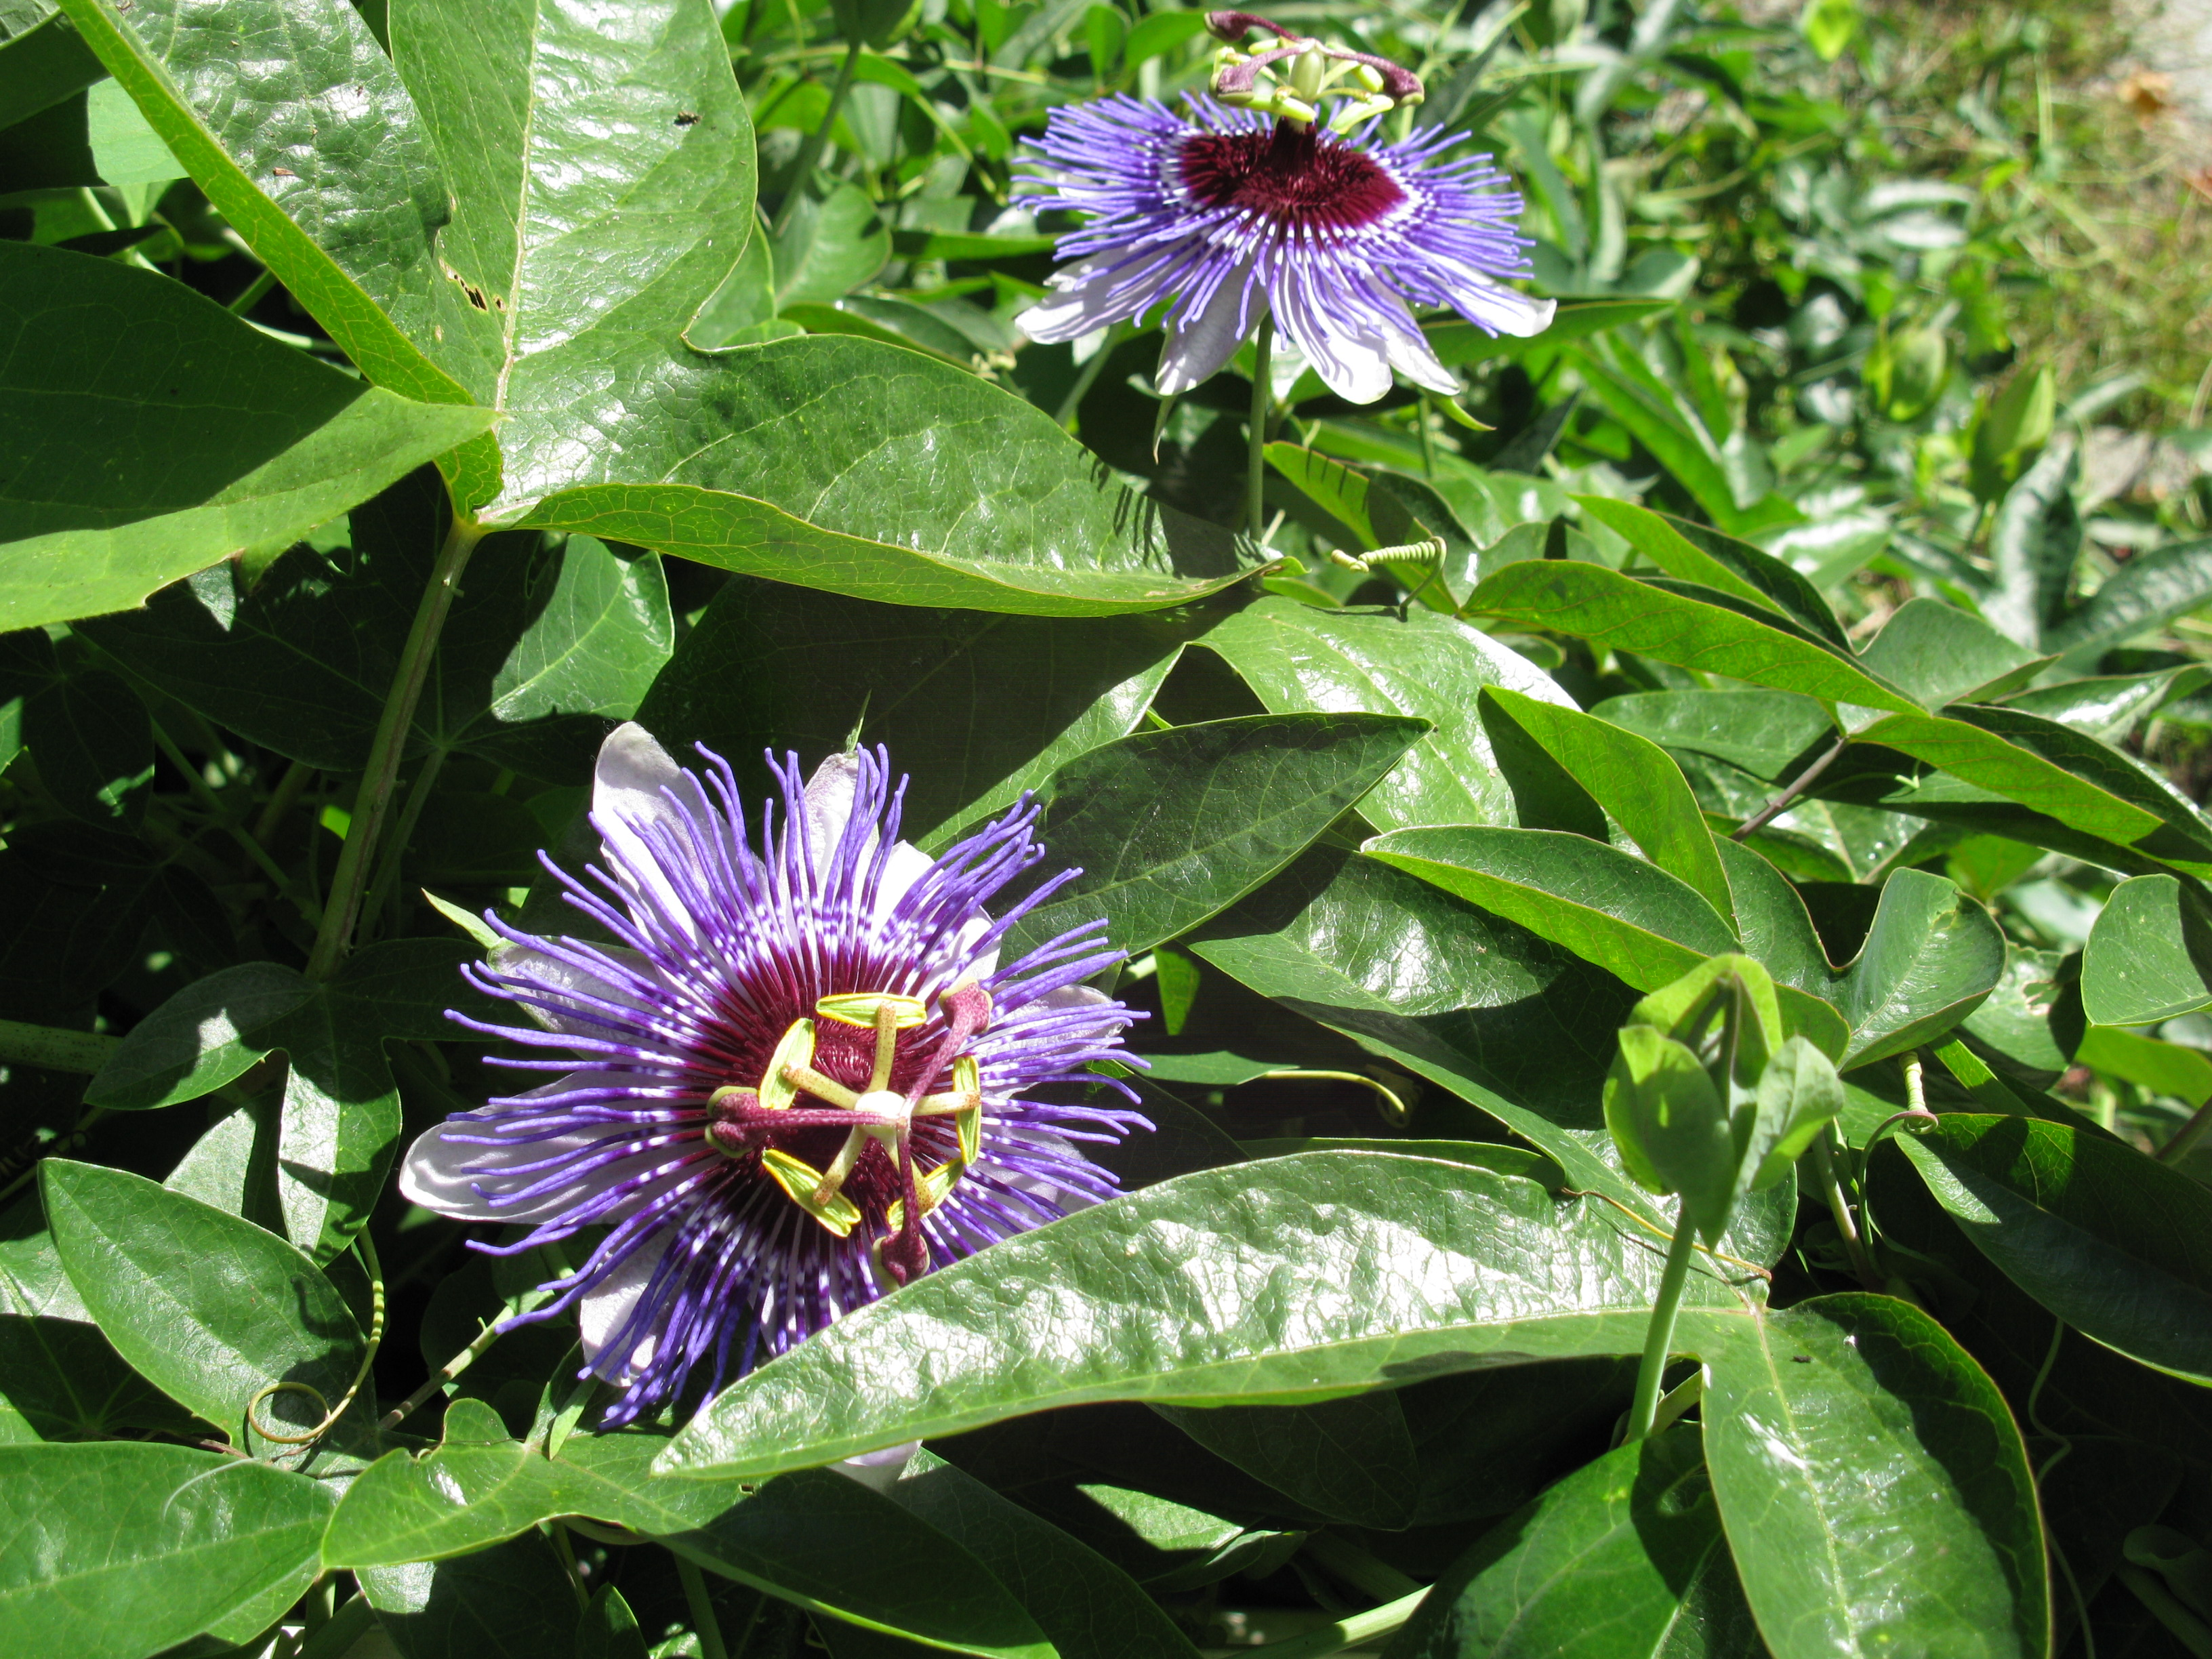 Half hardy plants insulate for winter protection uconnladybug 39 s blog - Hardy houseplants ...